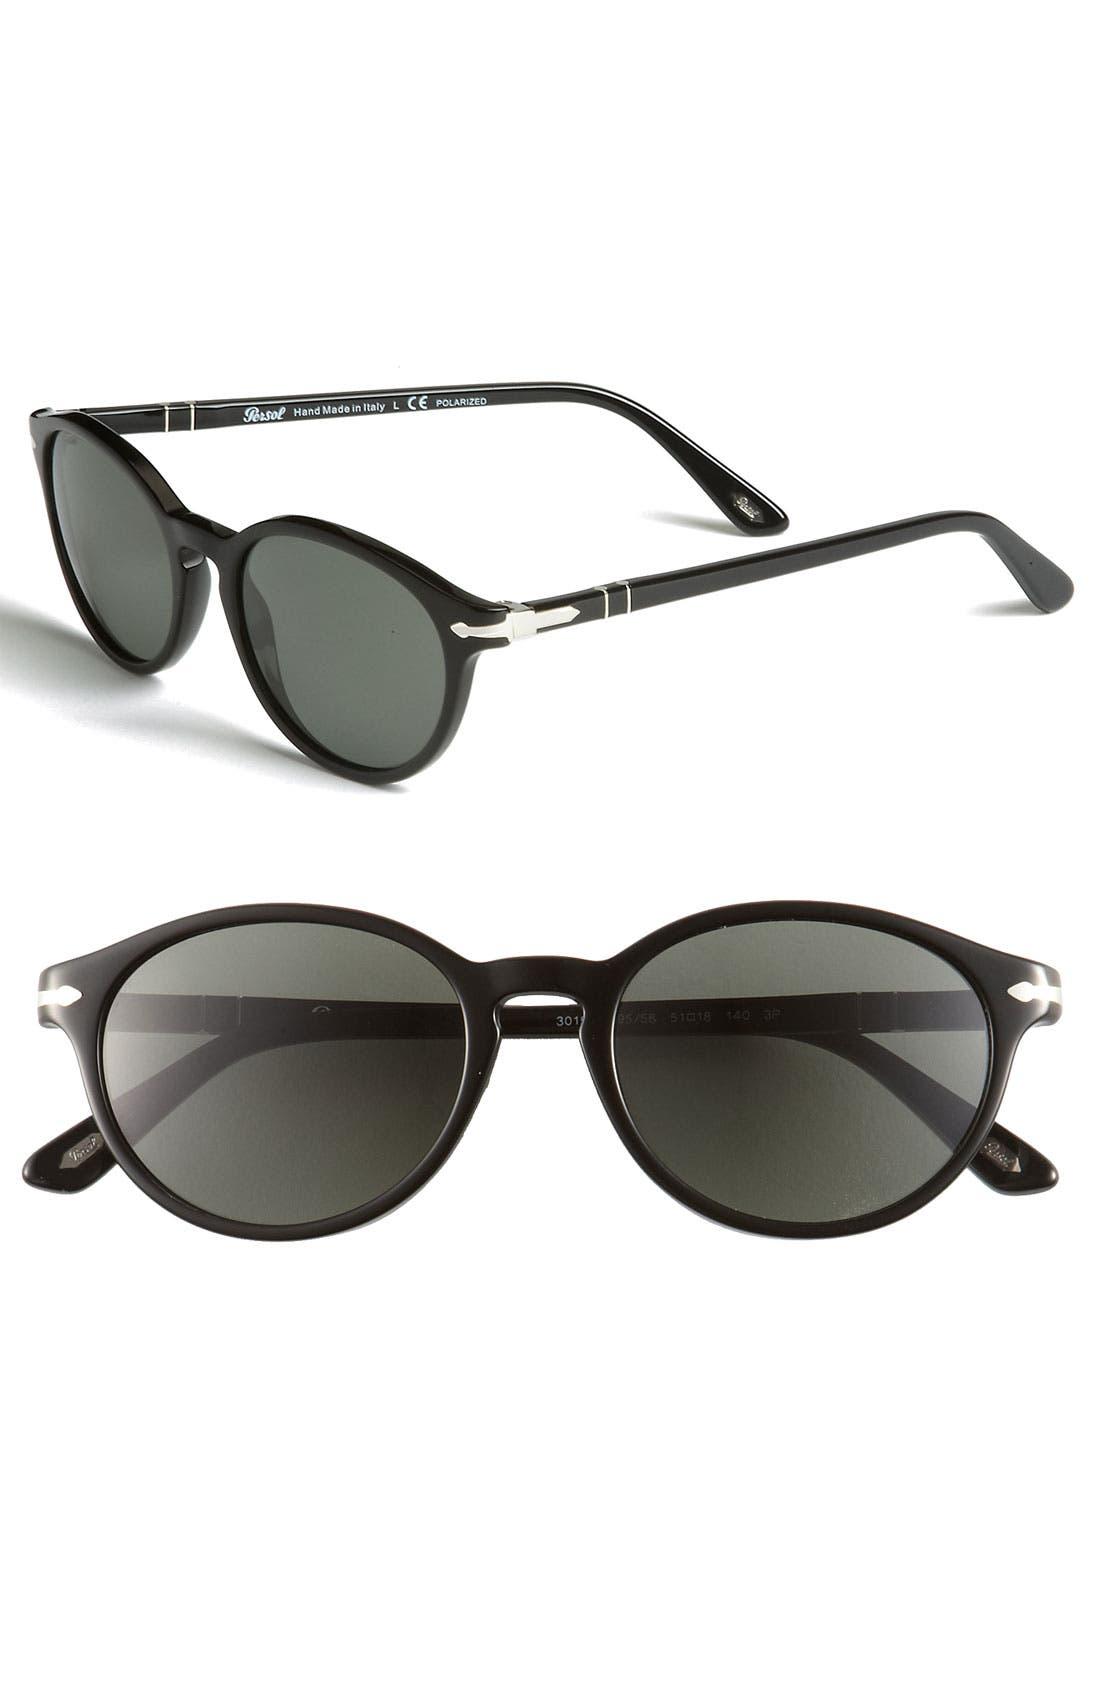 Main Image - Persol 51mm Polarized Keyhole Sunglasses